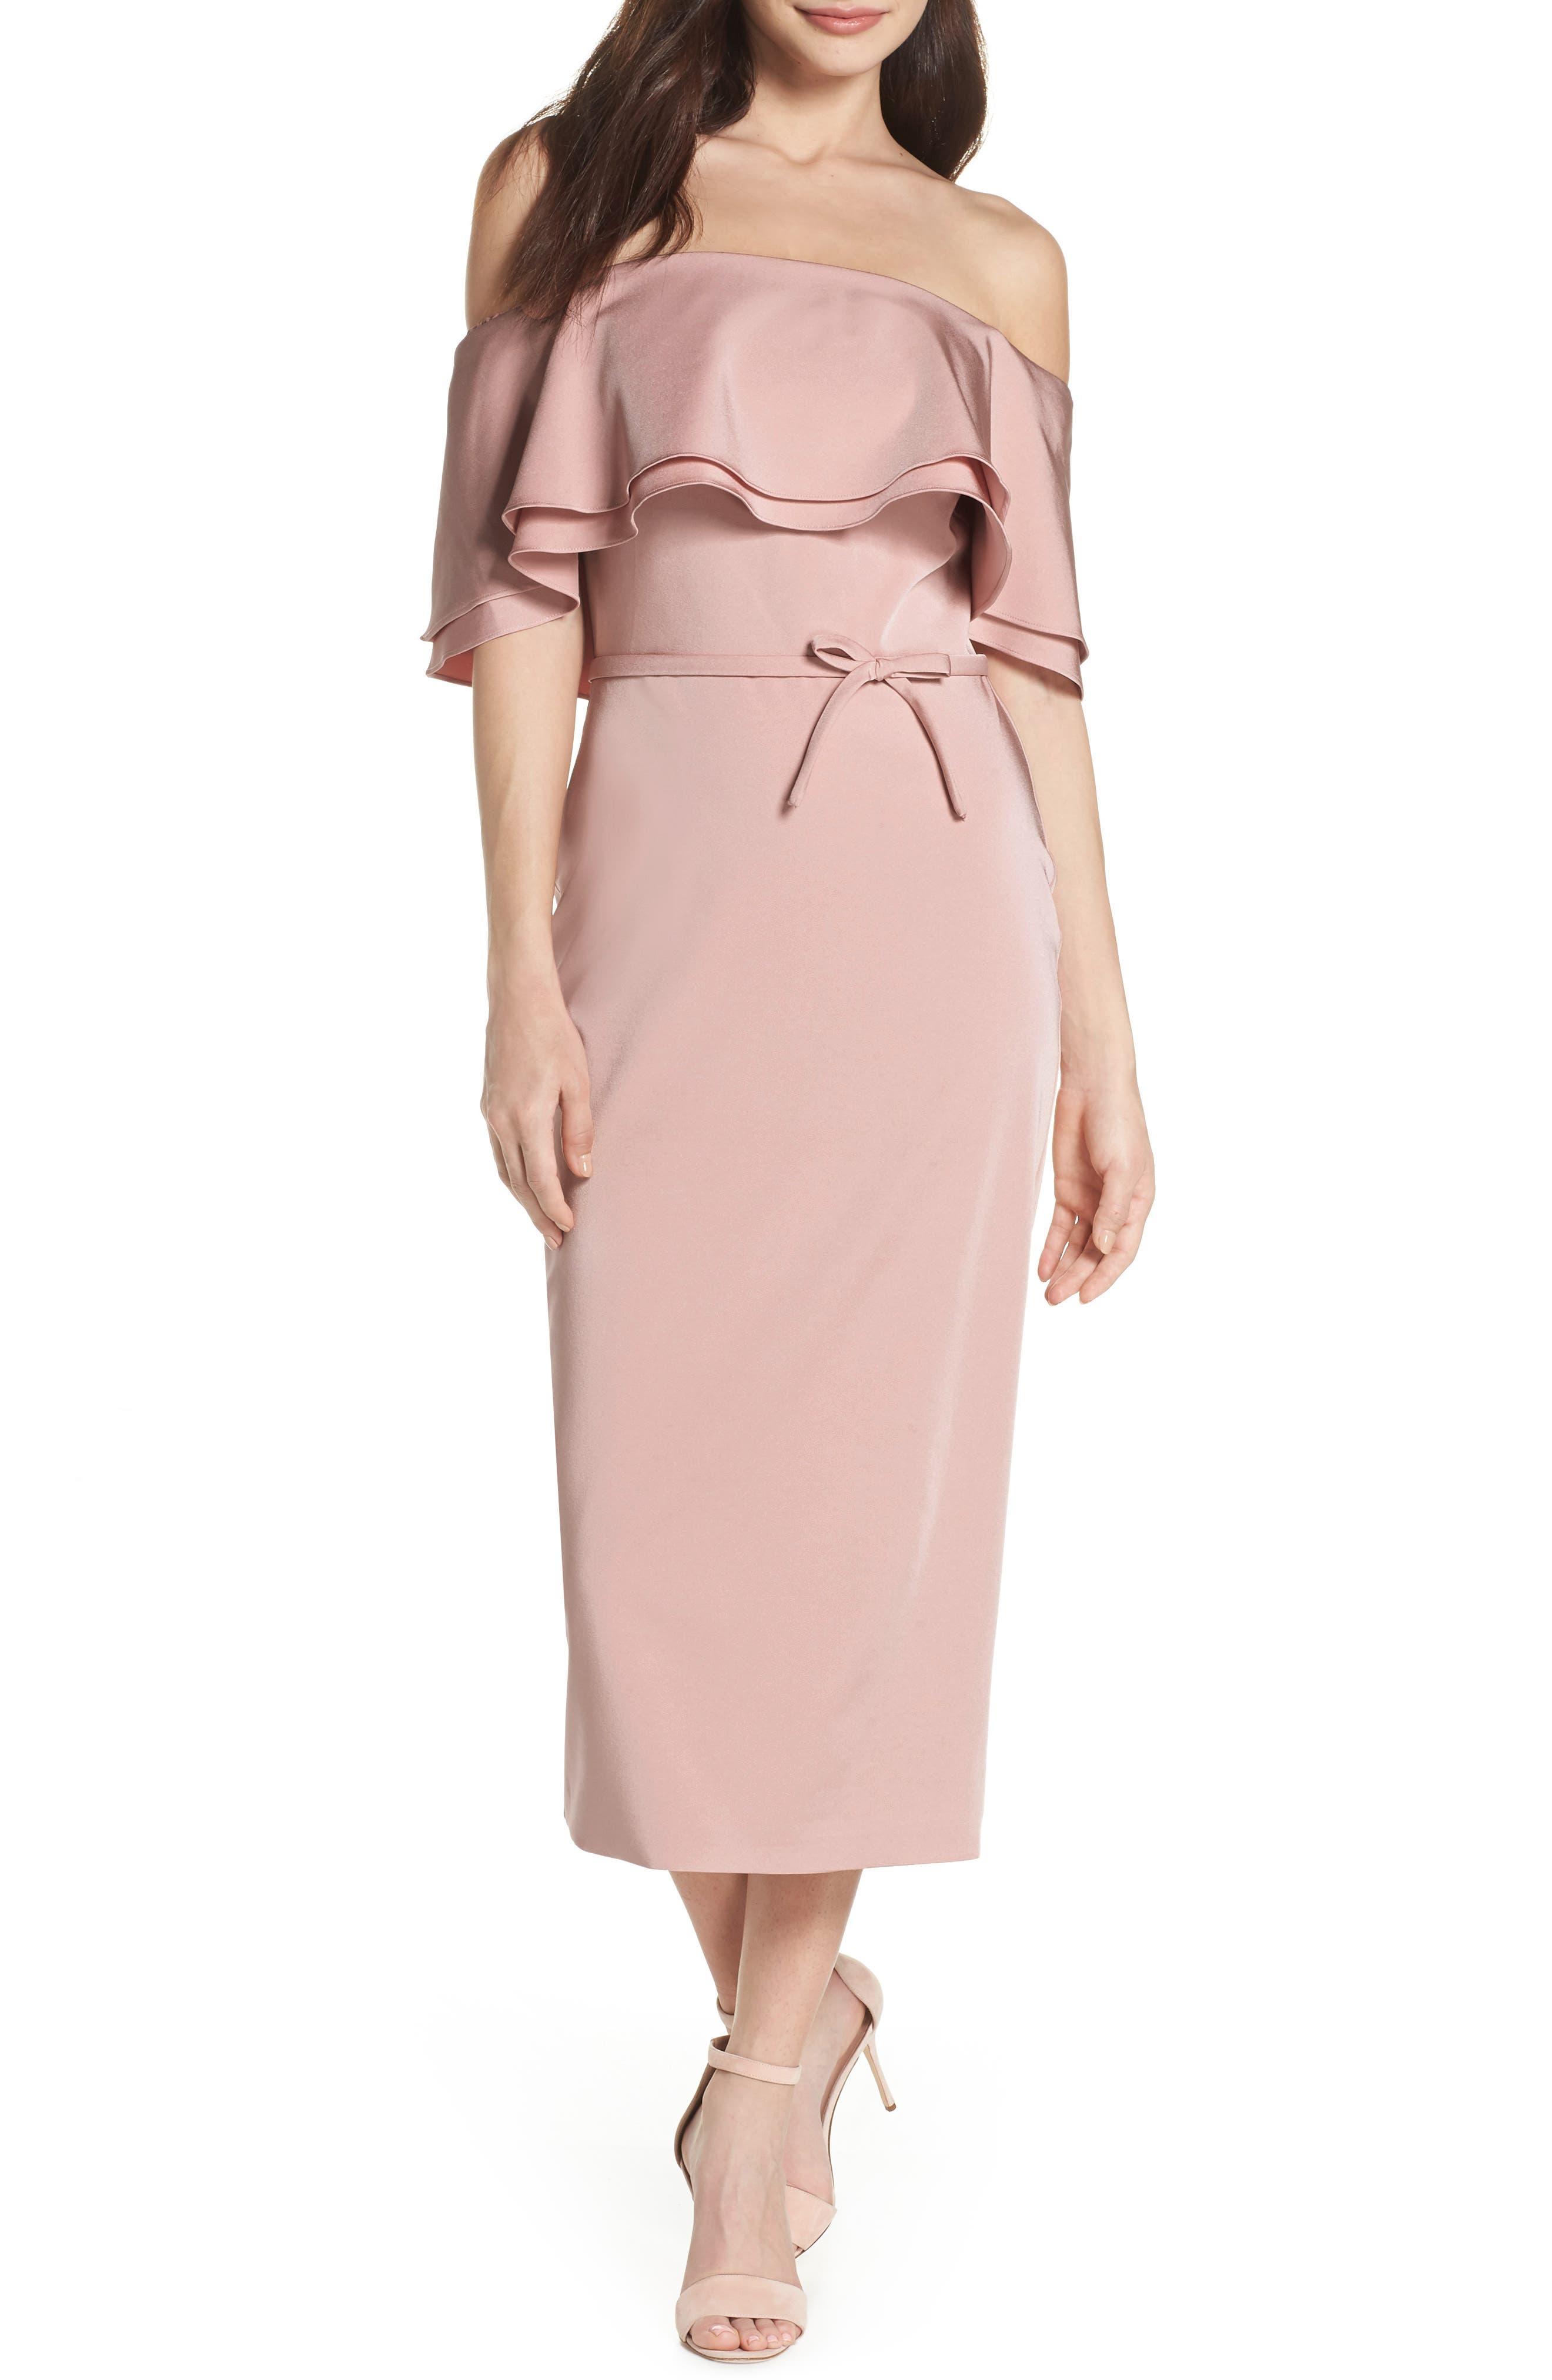 Ruffle Off the Shoulder Tea Length Dress,                         Main,                         color, Rose